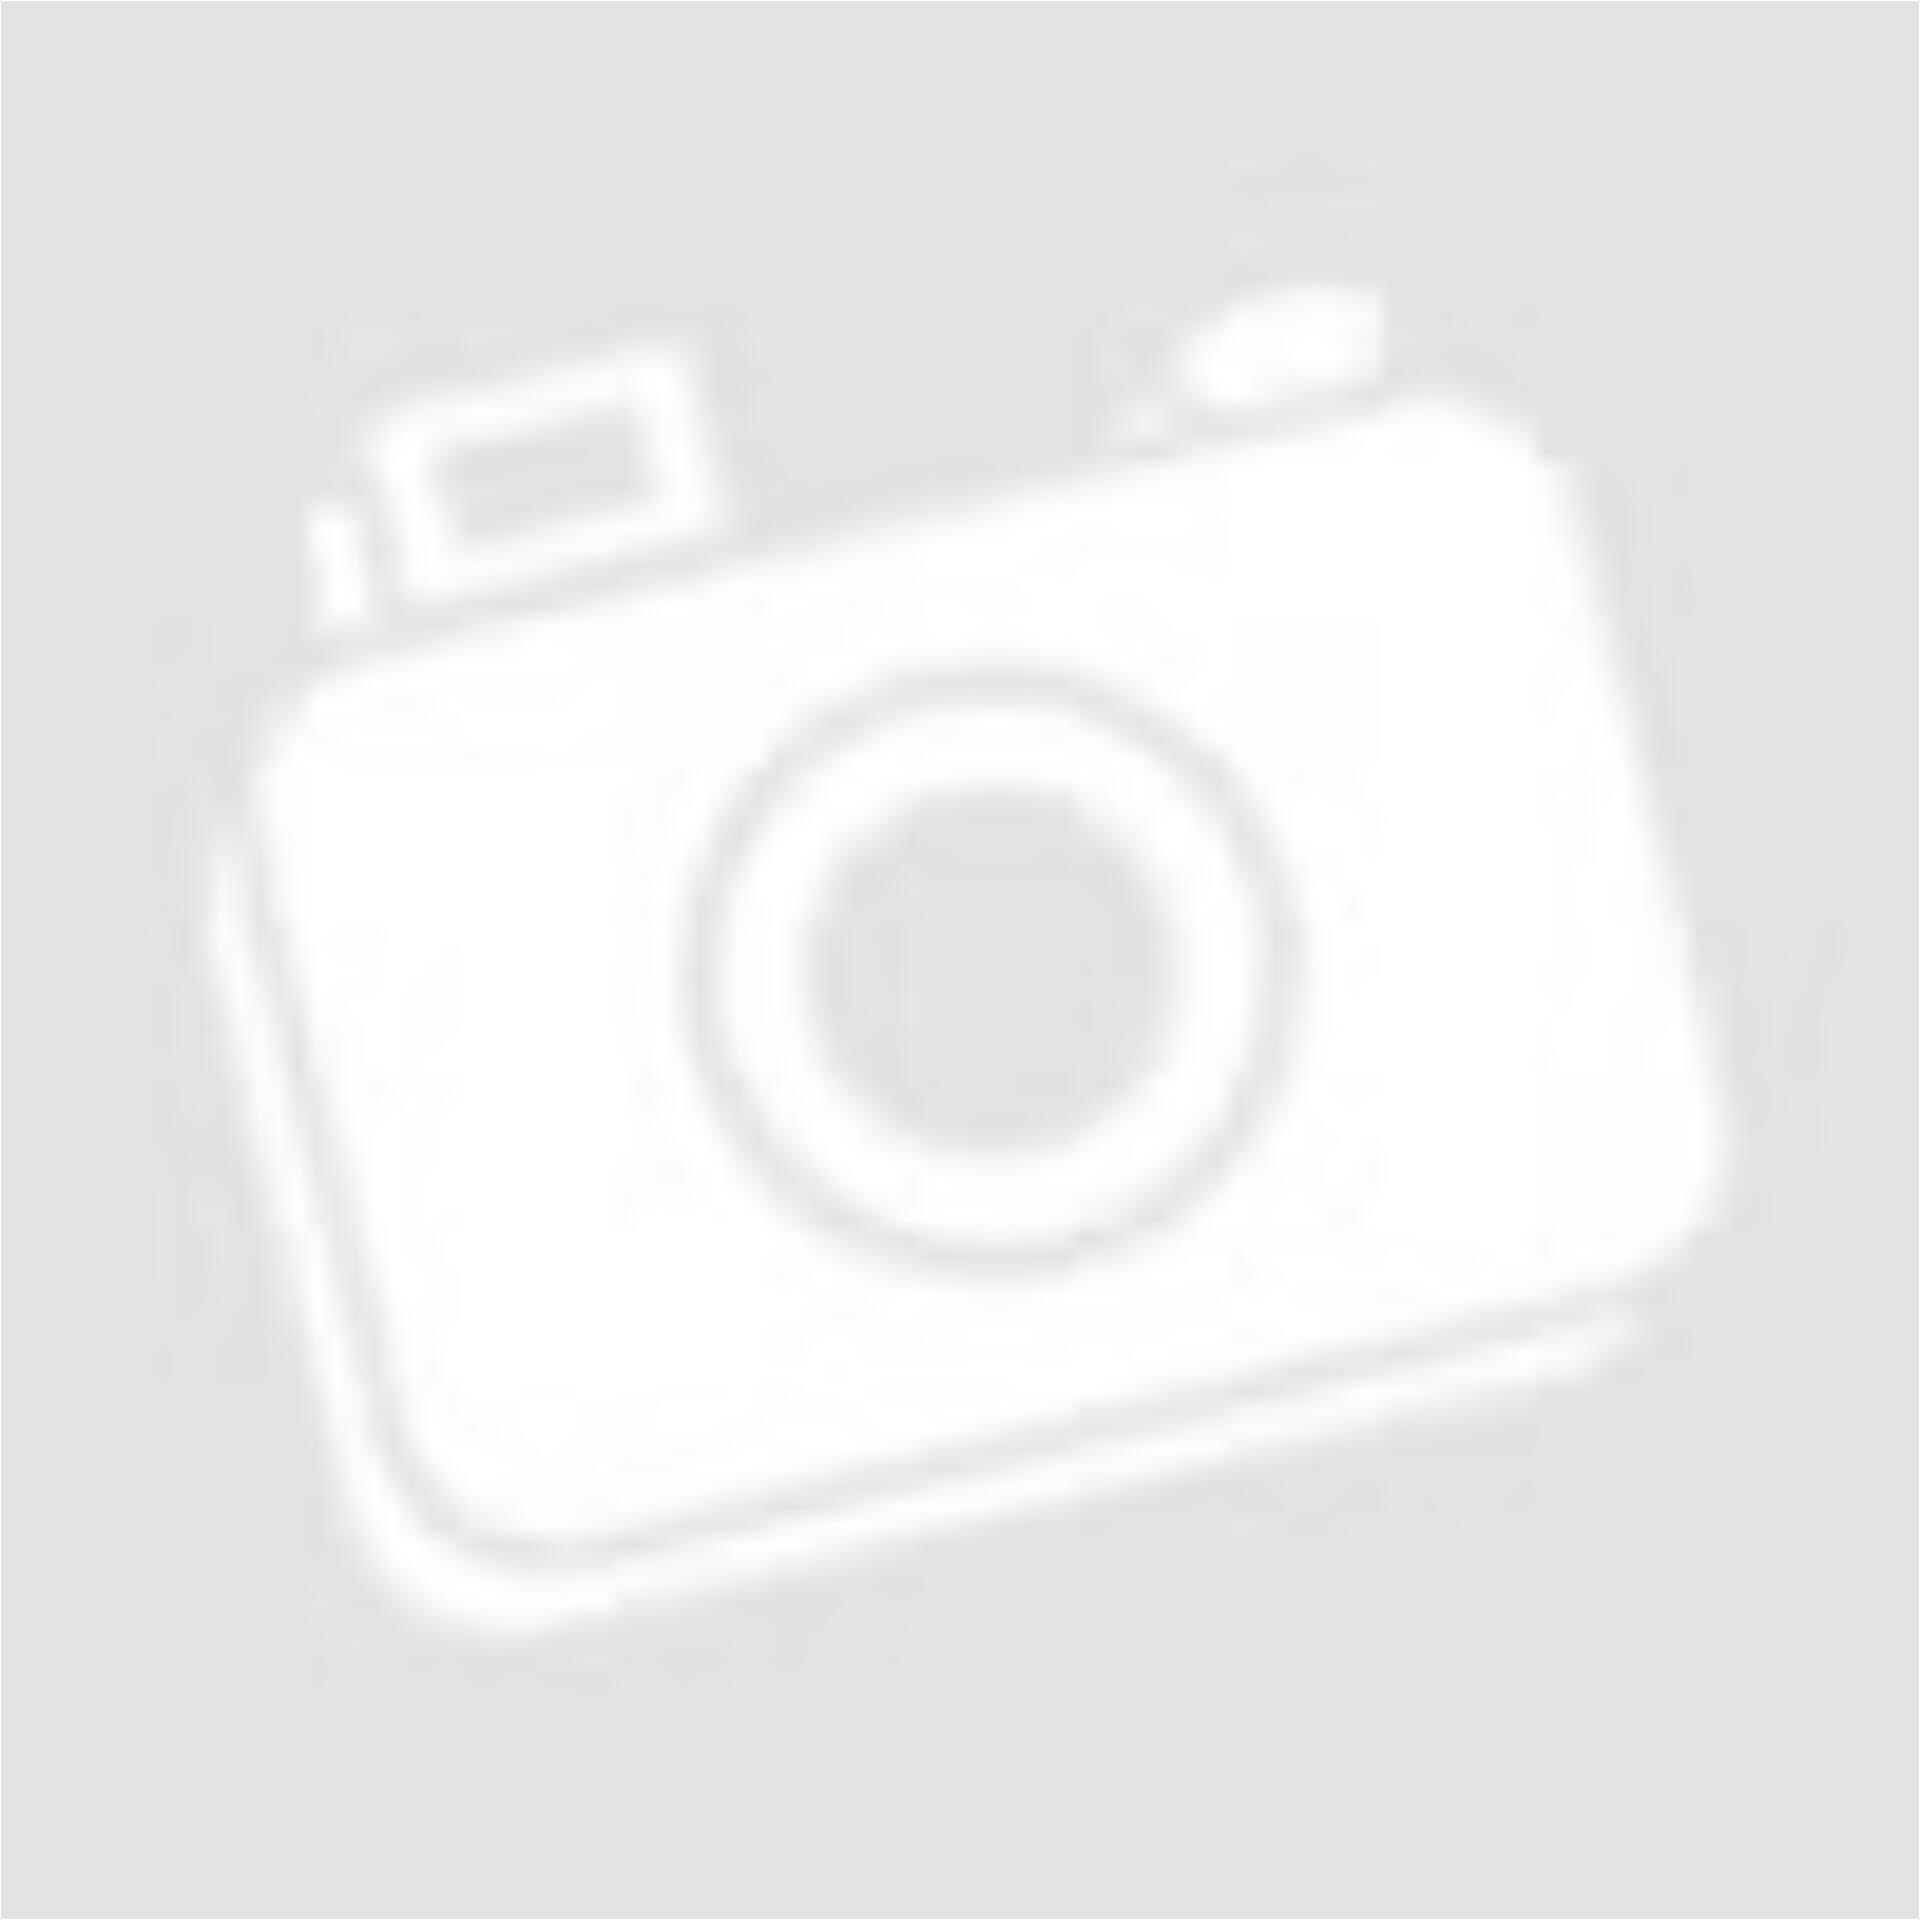 a39f2e2327 Eistrar fekete norvég mintás pulóver (Méret: M) - Női pulóver ...